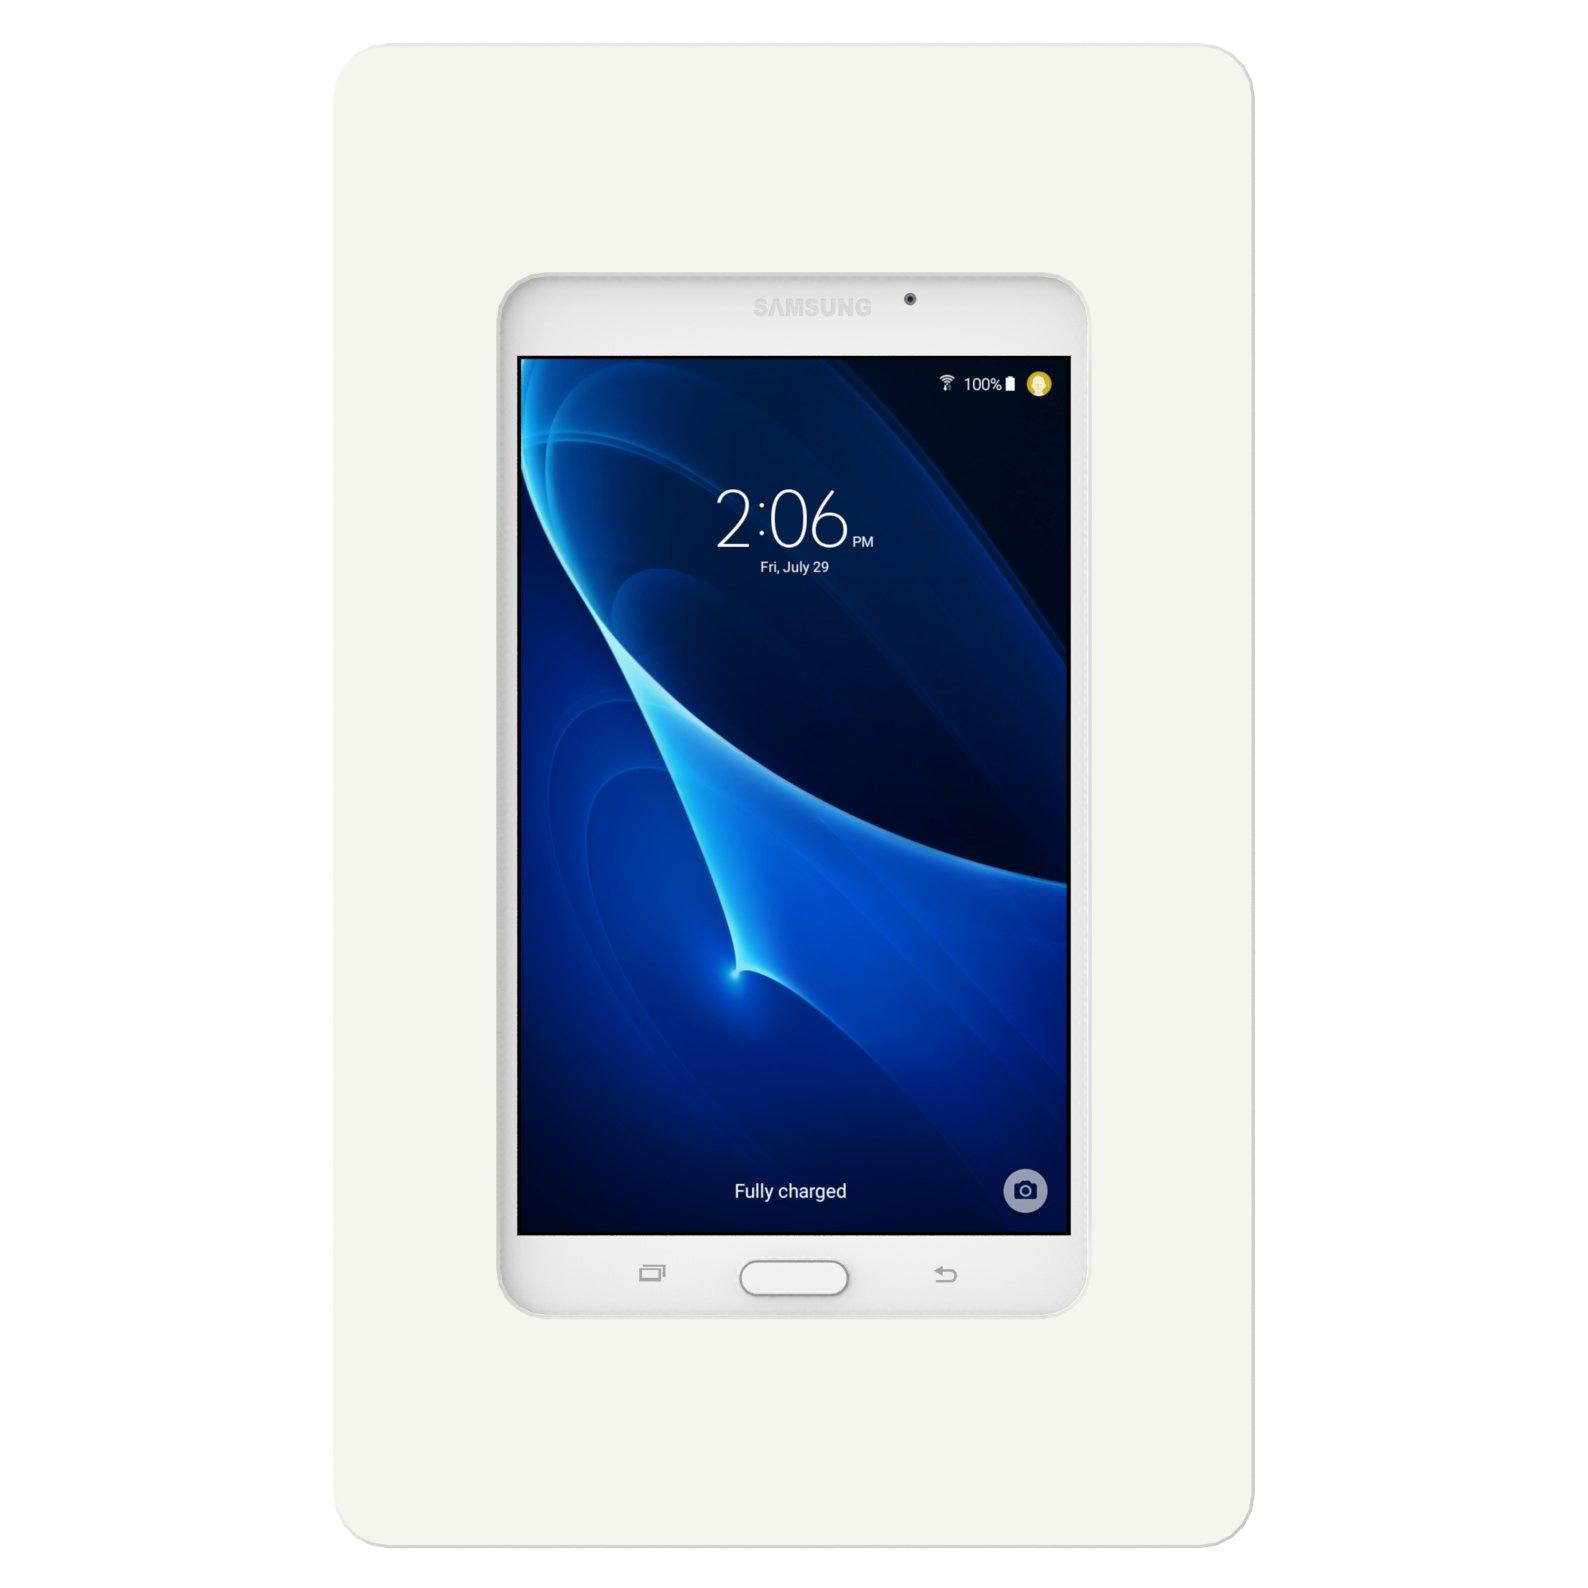 VidaMount On-Wall Tablet Mount - Samsung Galaxy Tab A 7.0 - White by VidaBox Kiosks (Image #3)